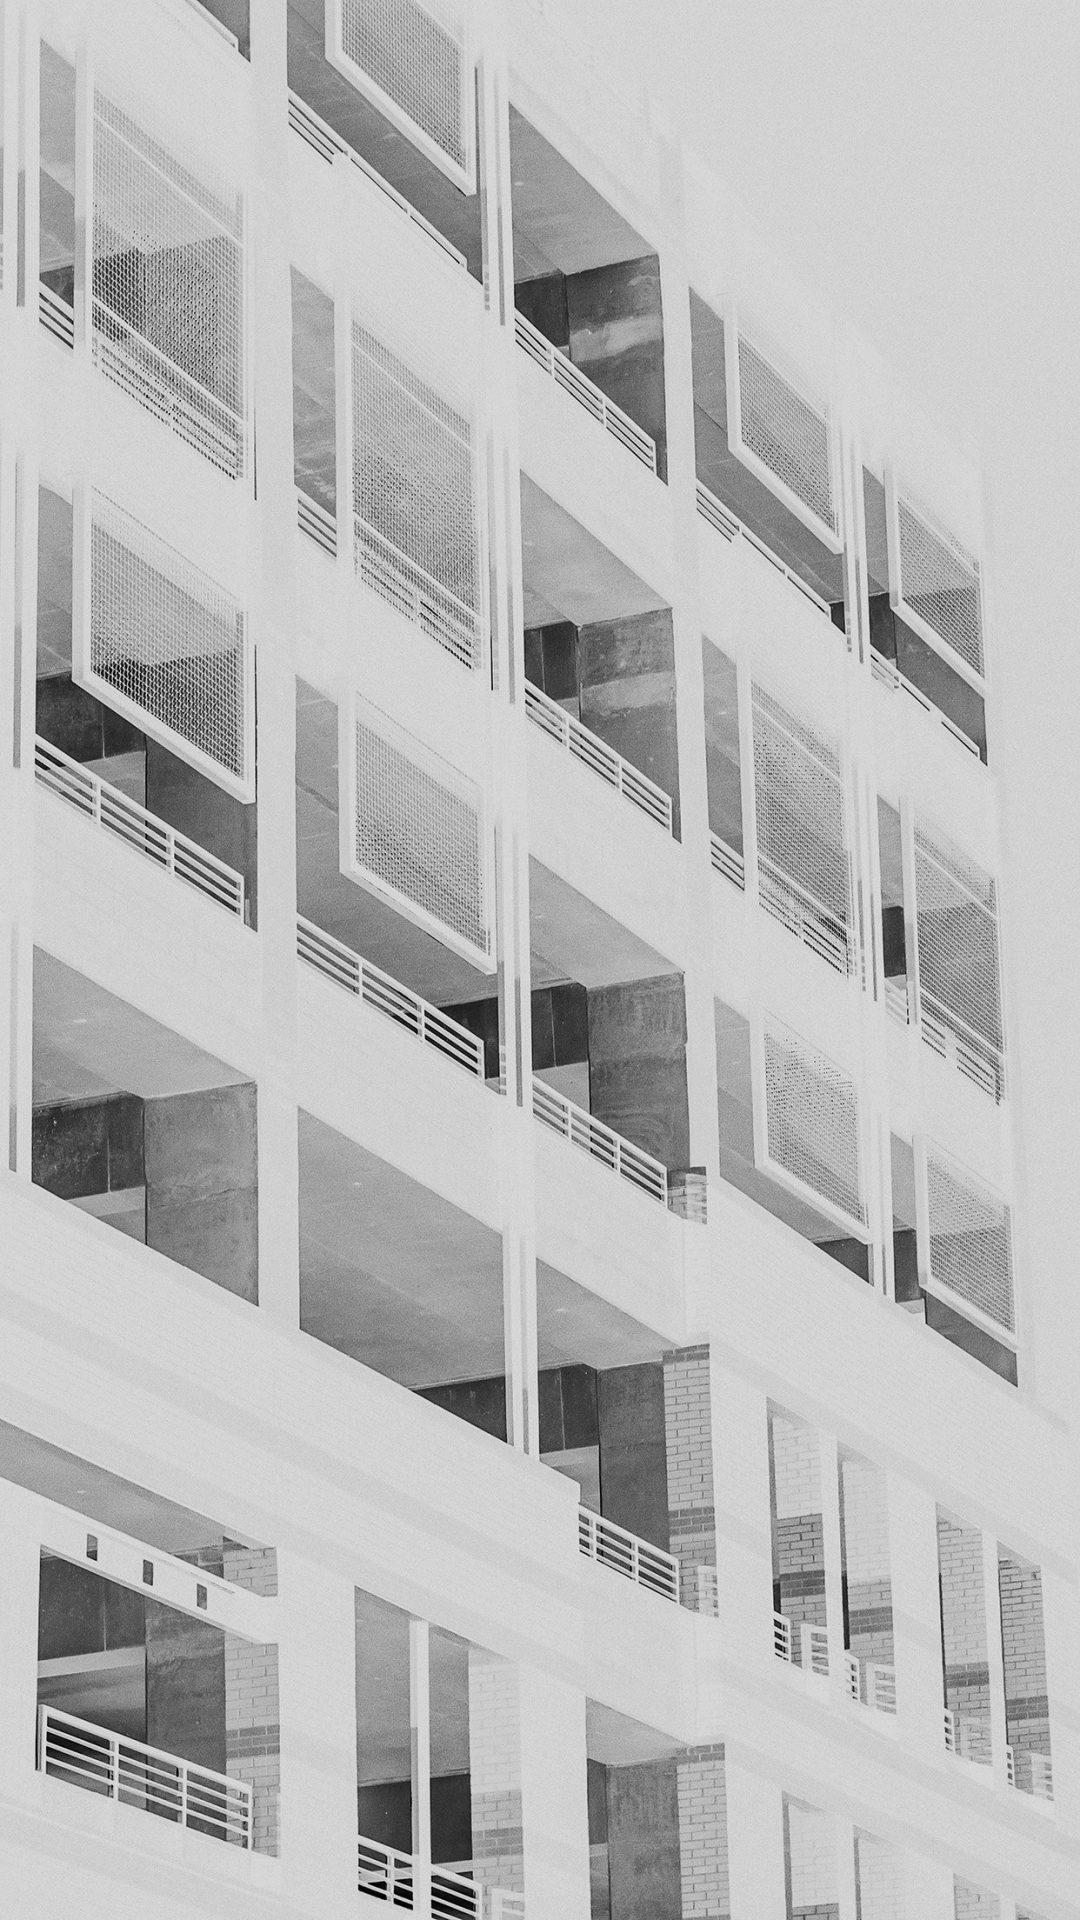 Bw Night Building Window White Architecture City